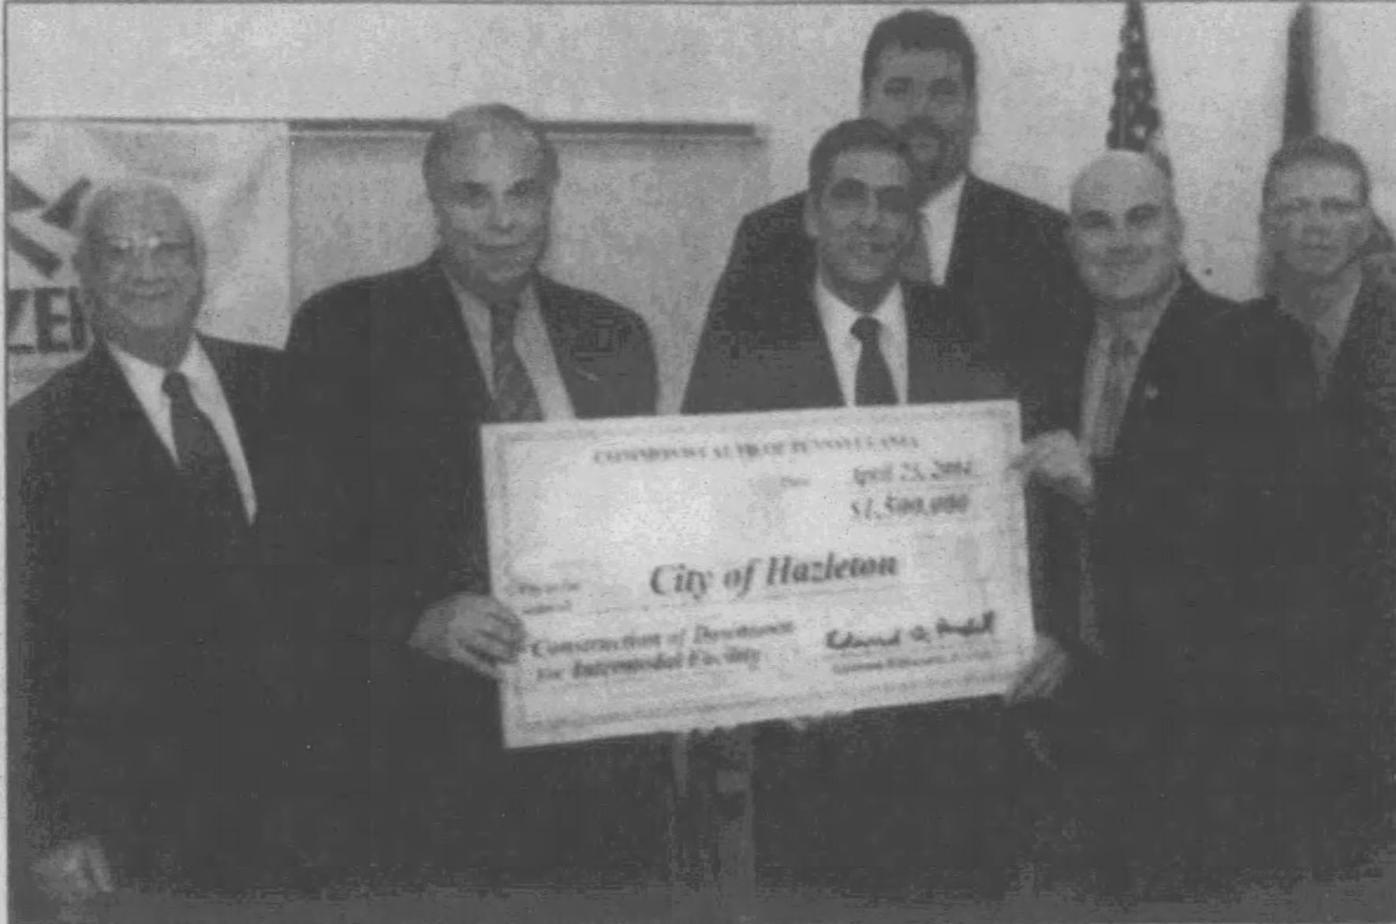 Governor visited LCCC Hazleton in 2004